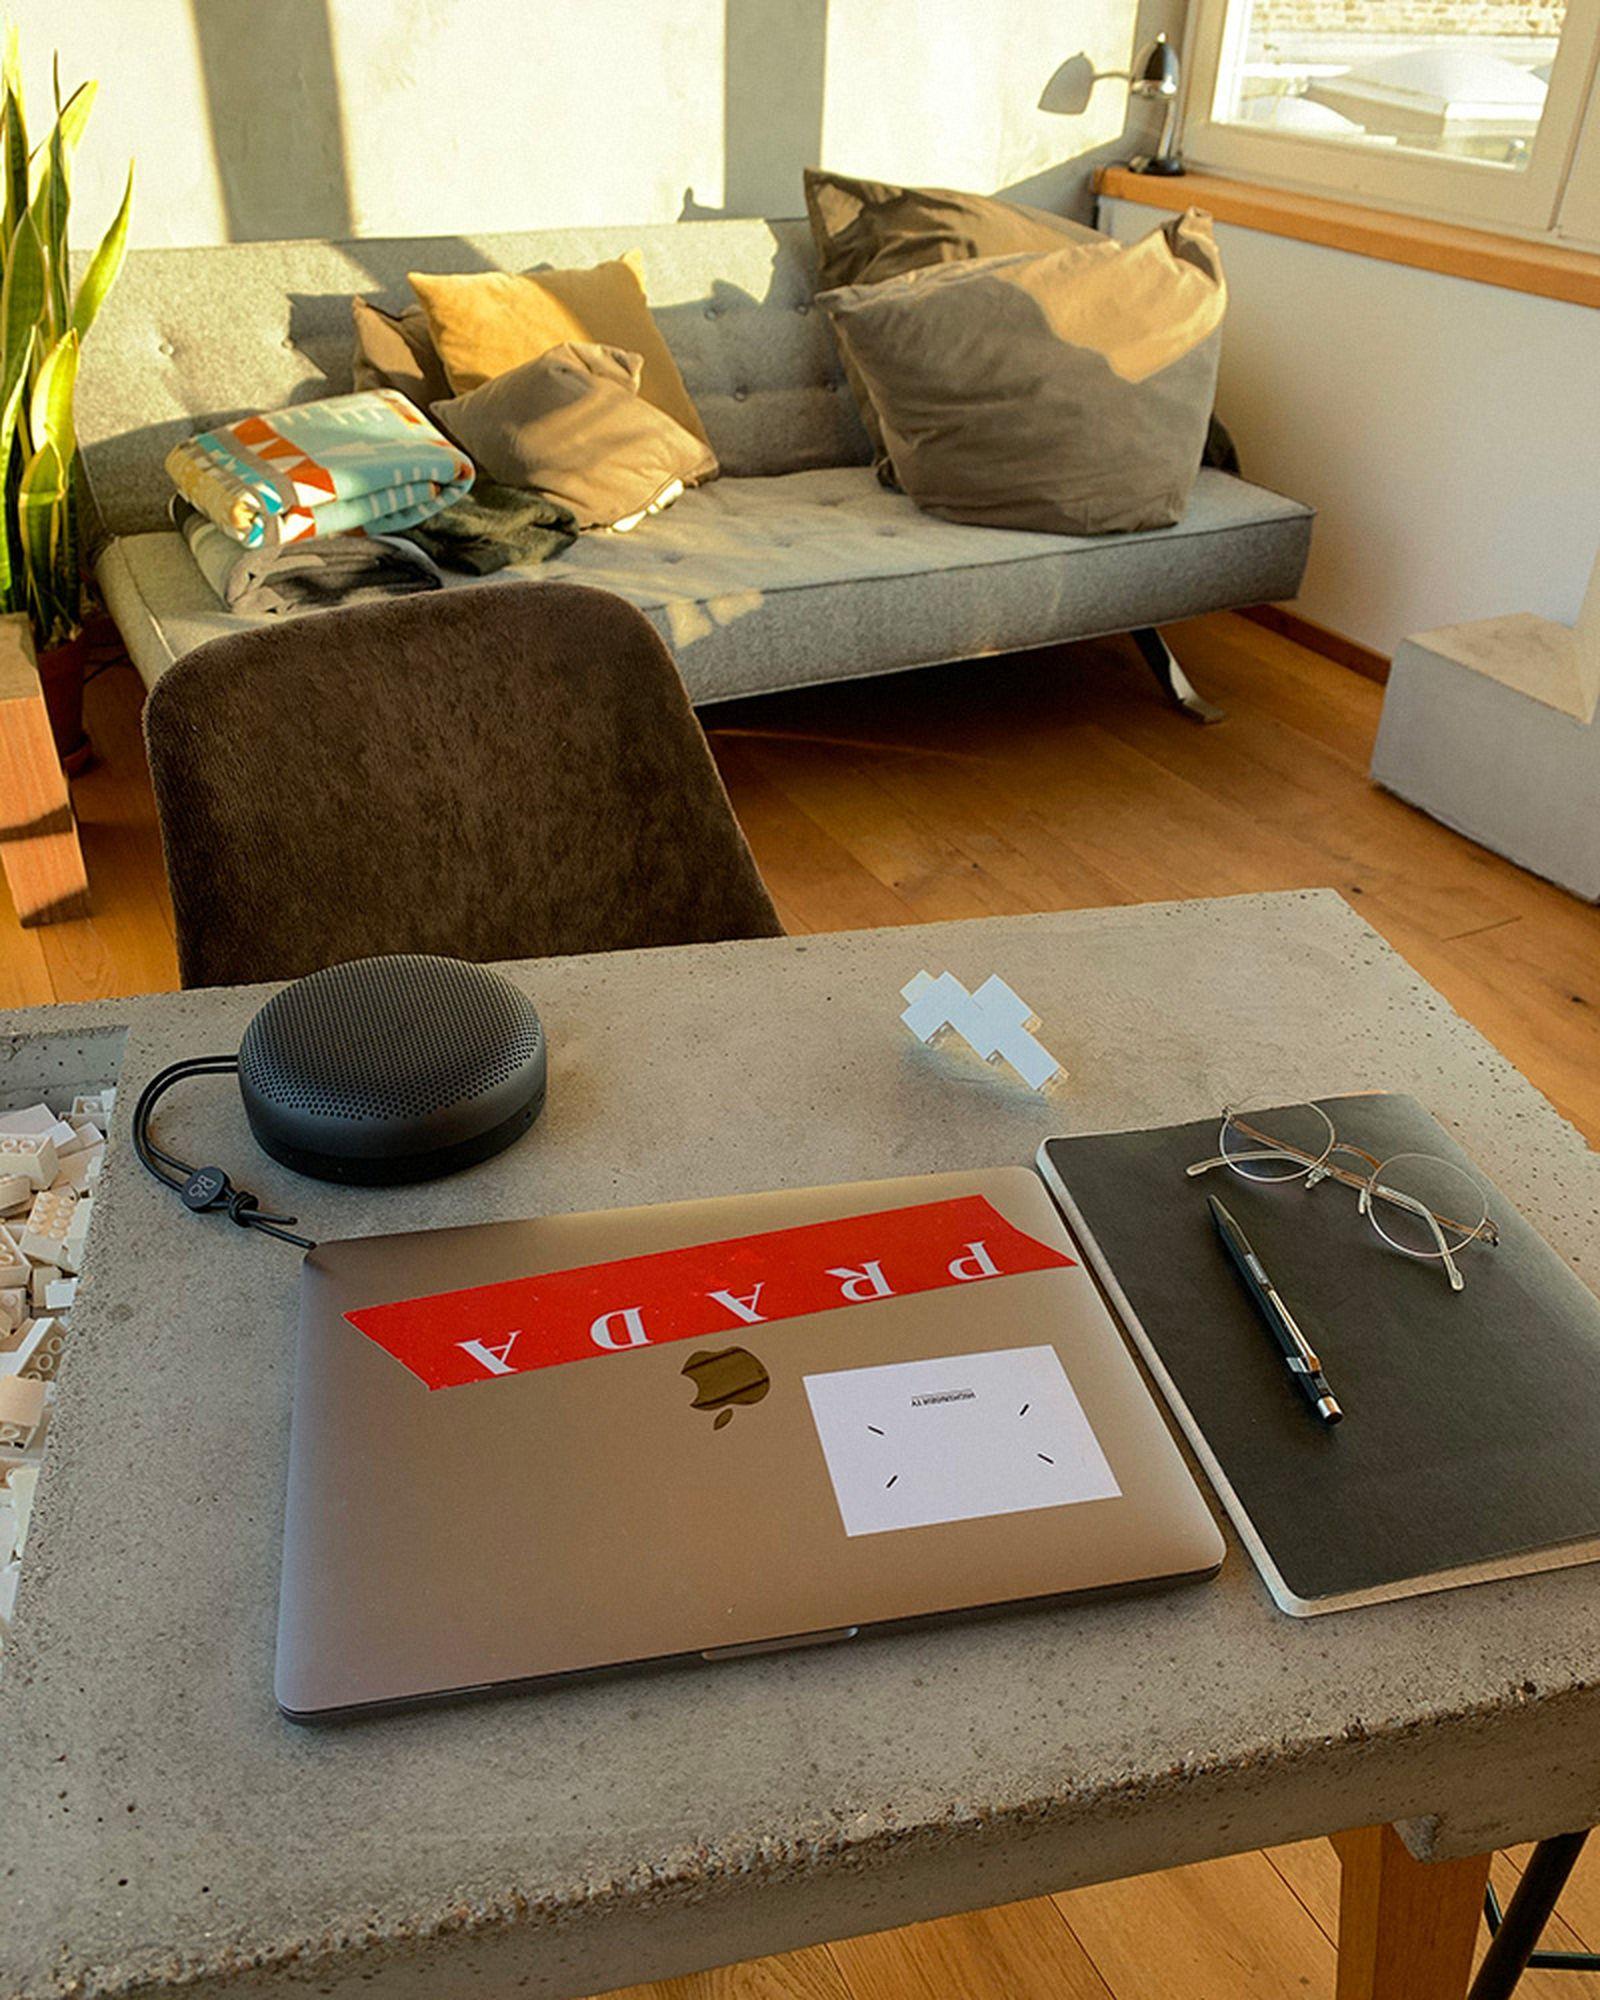 wfh-office-tour-look-inside-home-offices-herbert-02